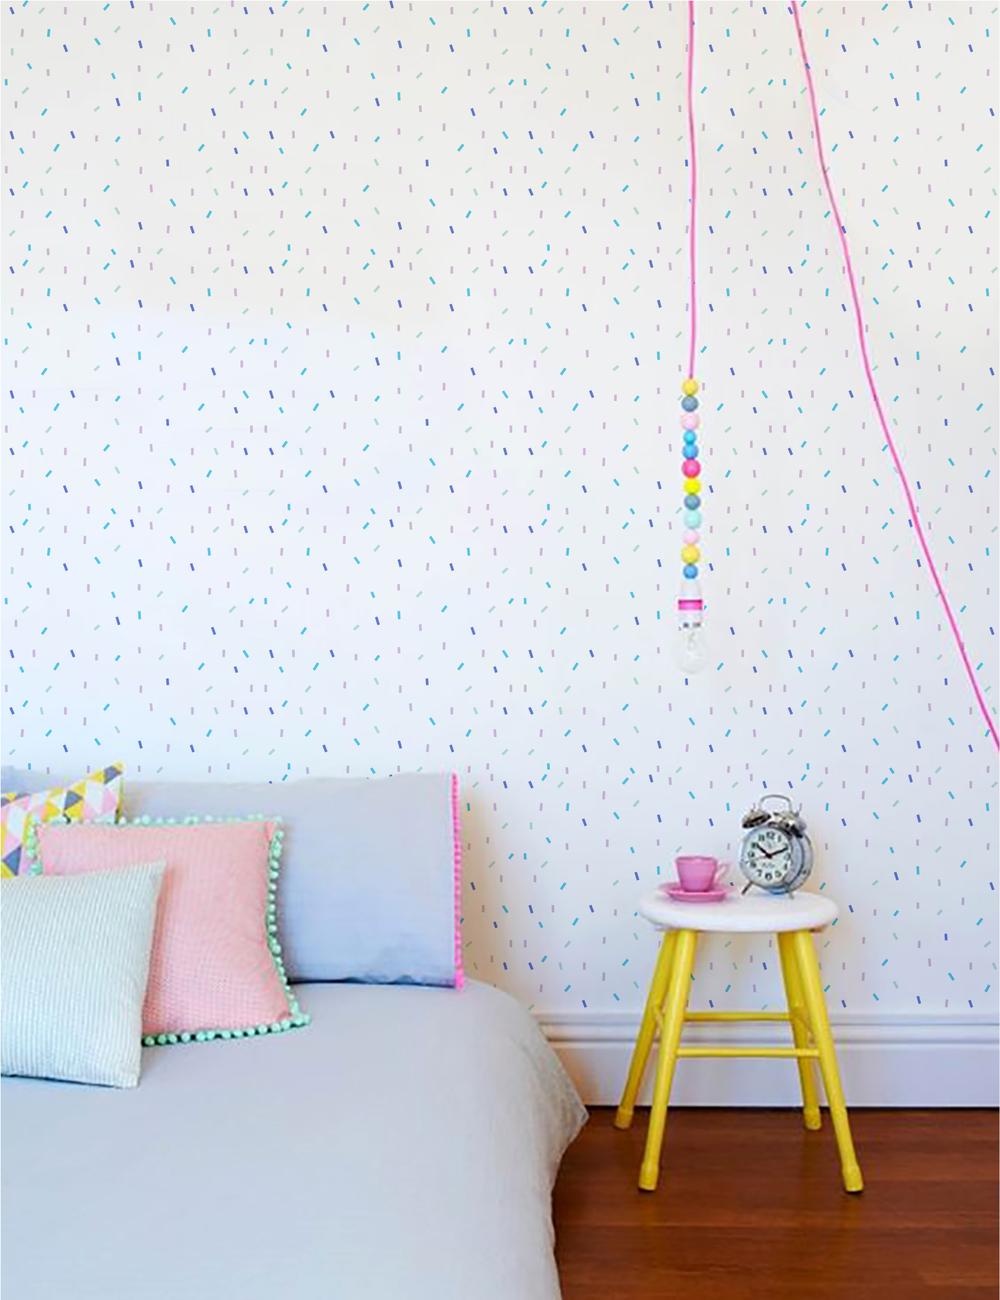 quarto-menina-papel-de-parede-candy-housed-wallpapers.png